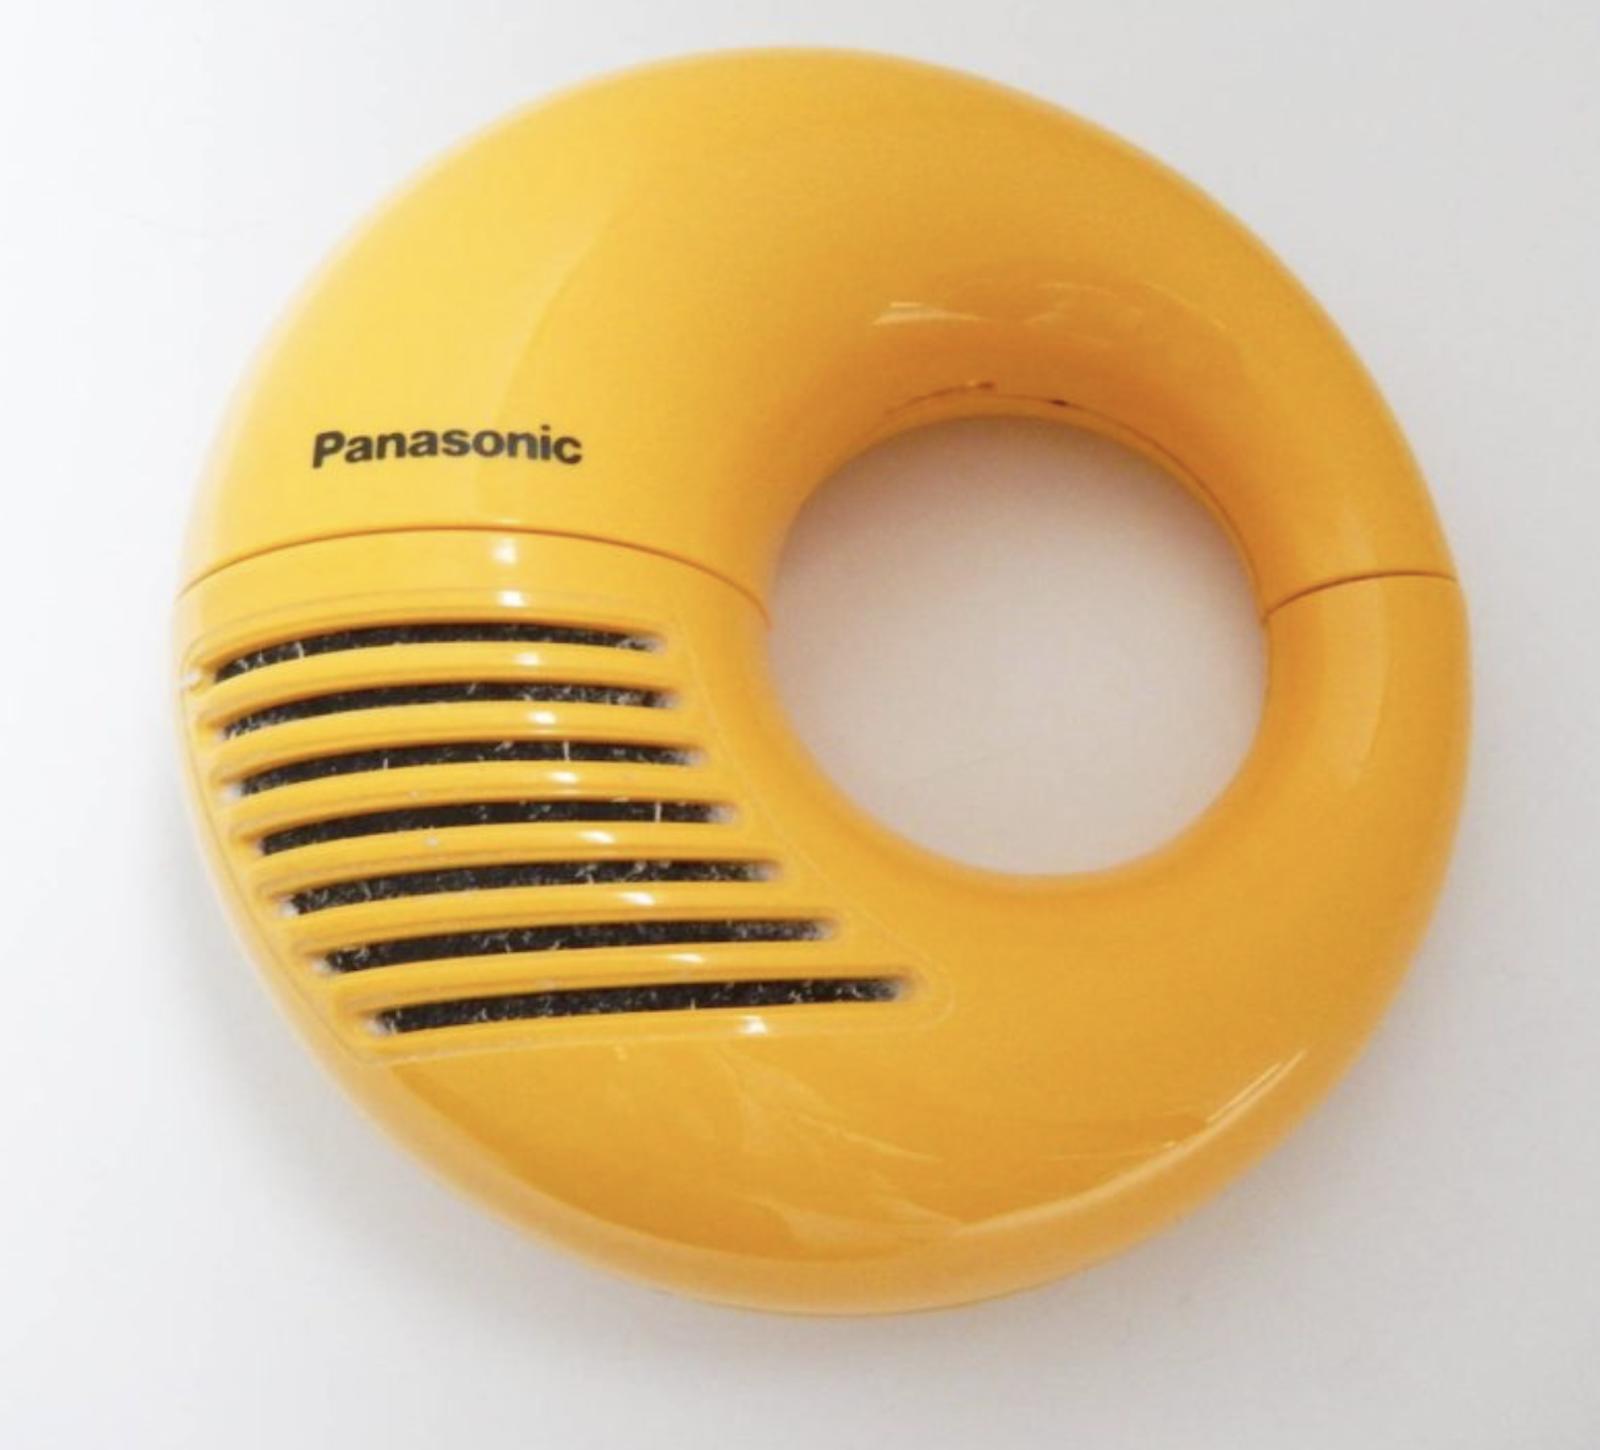 Panasonic Wrist Radio Circa 1970.png